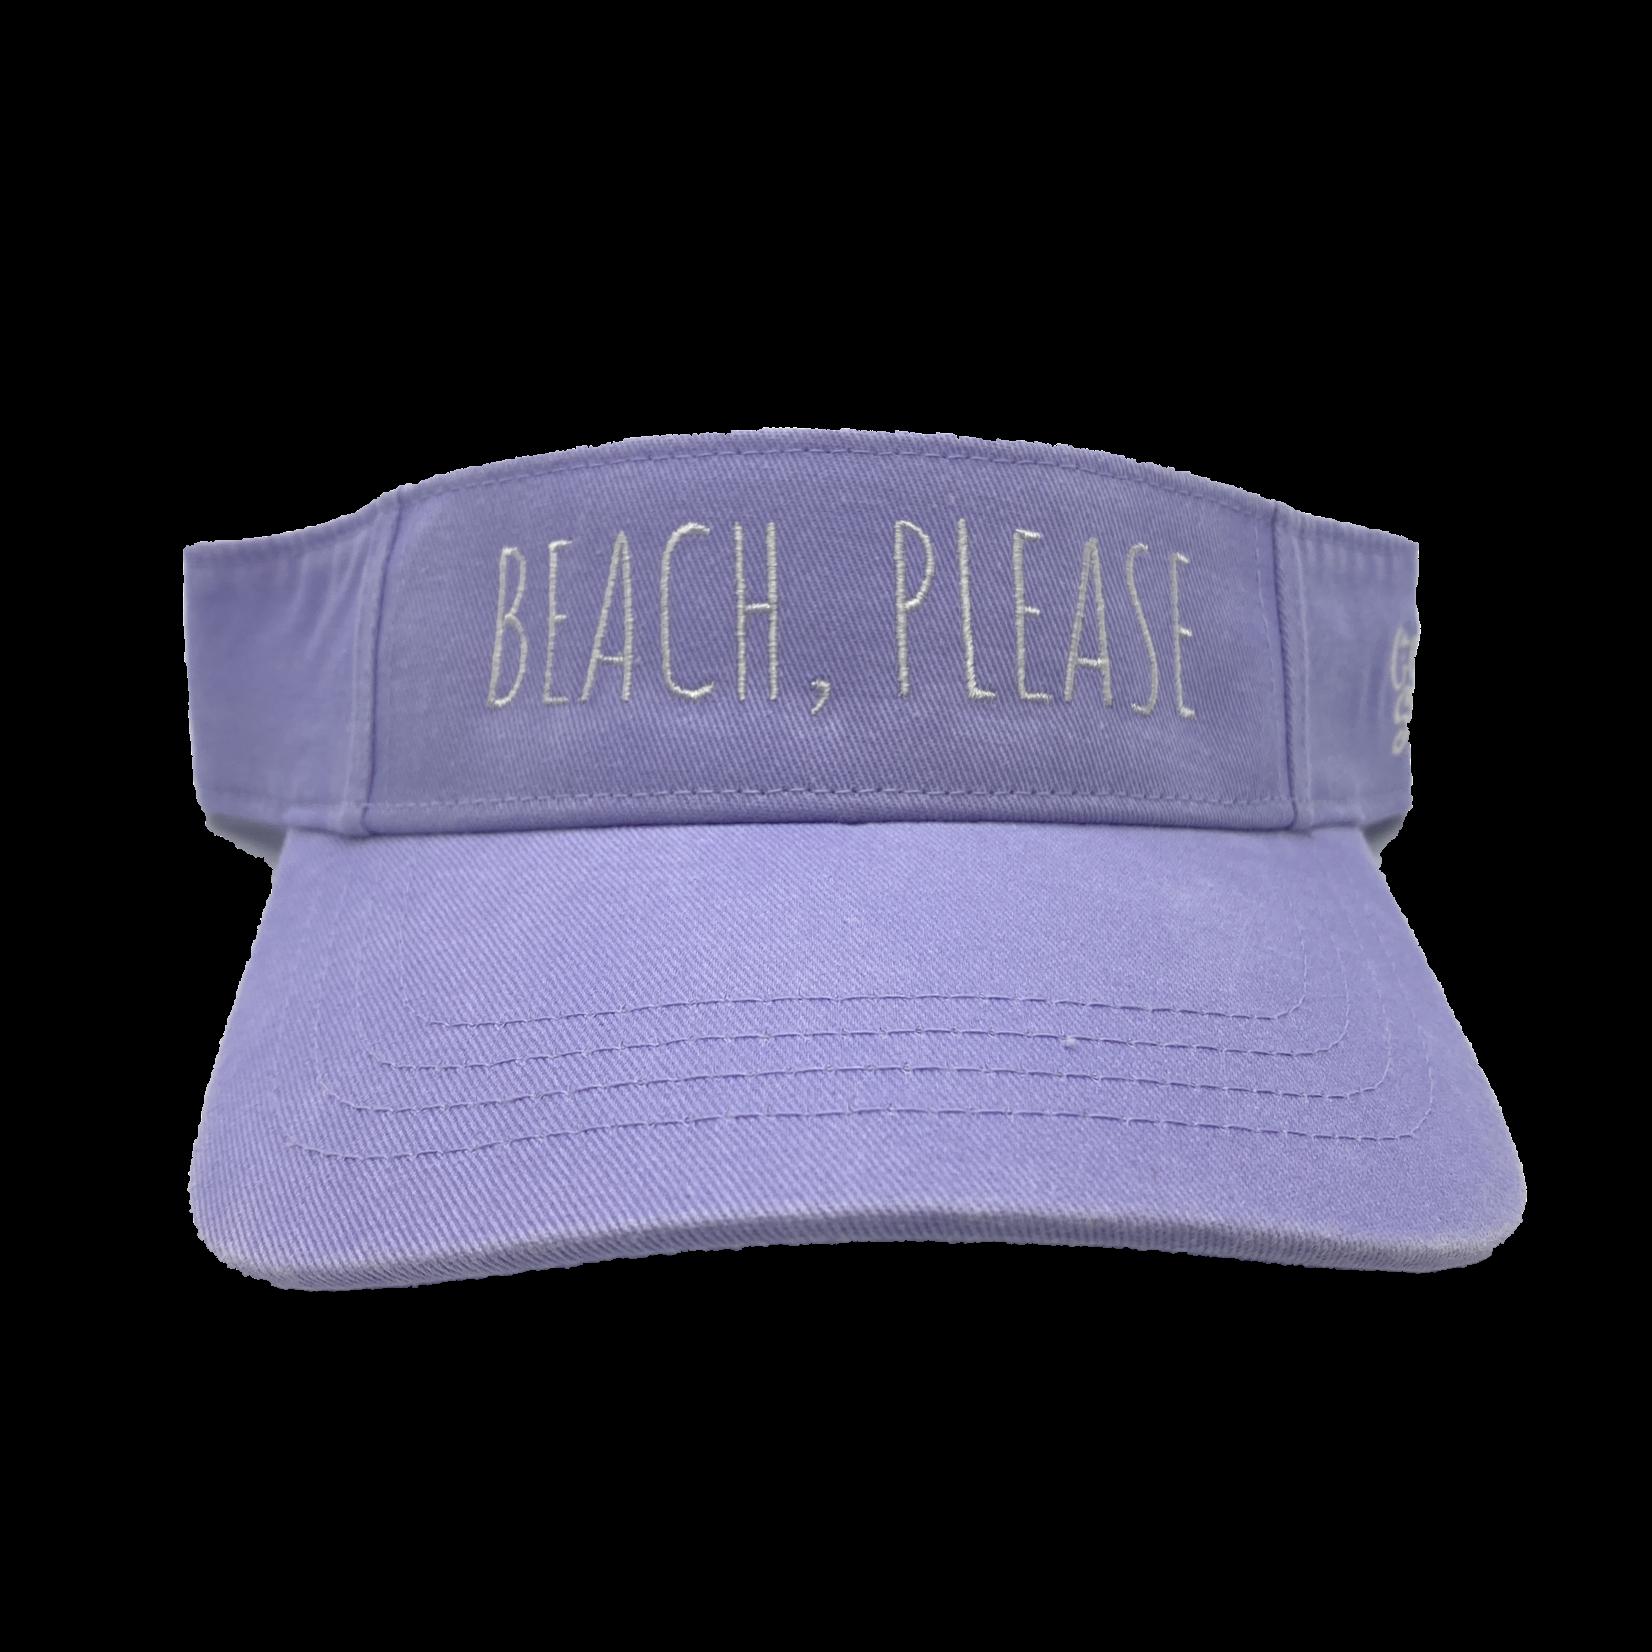 Beach Please Visor